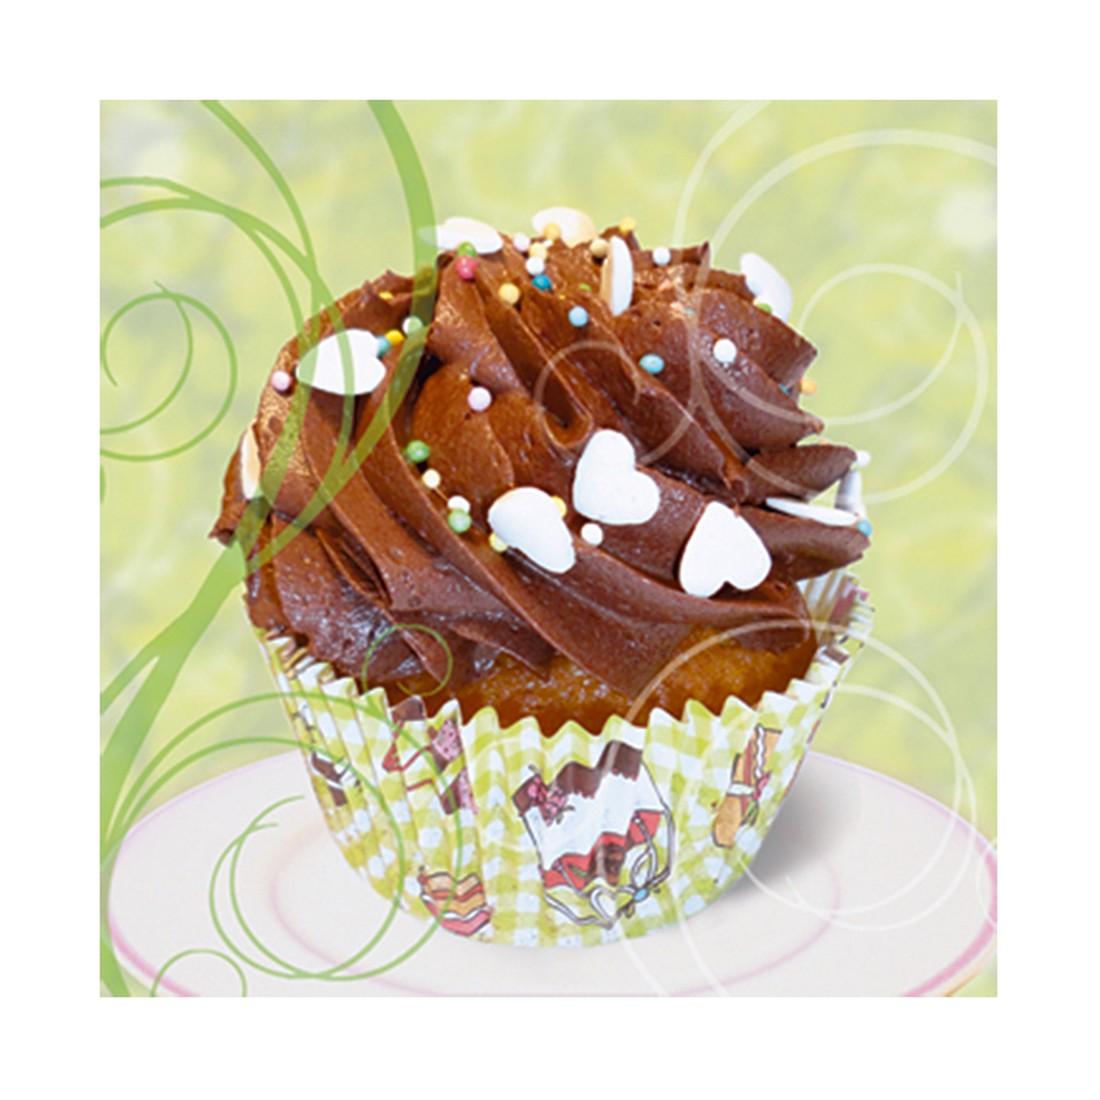 Glasbild Cupcake On Green - Größe: 50 x 50 cm, Artland